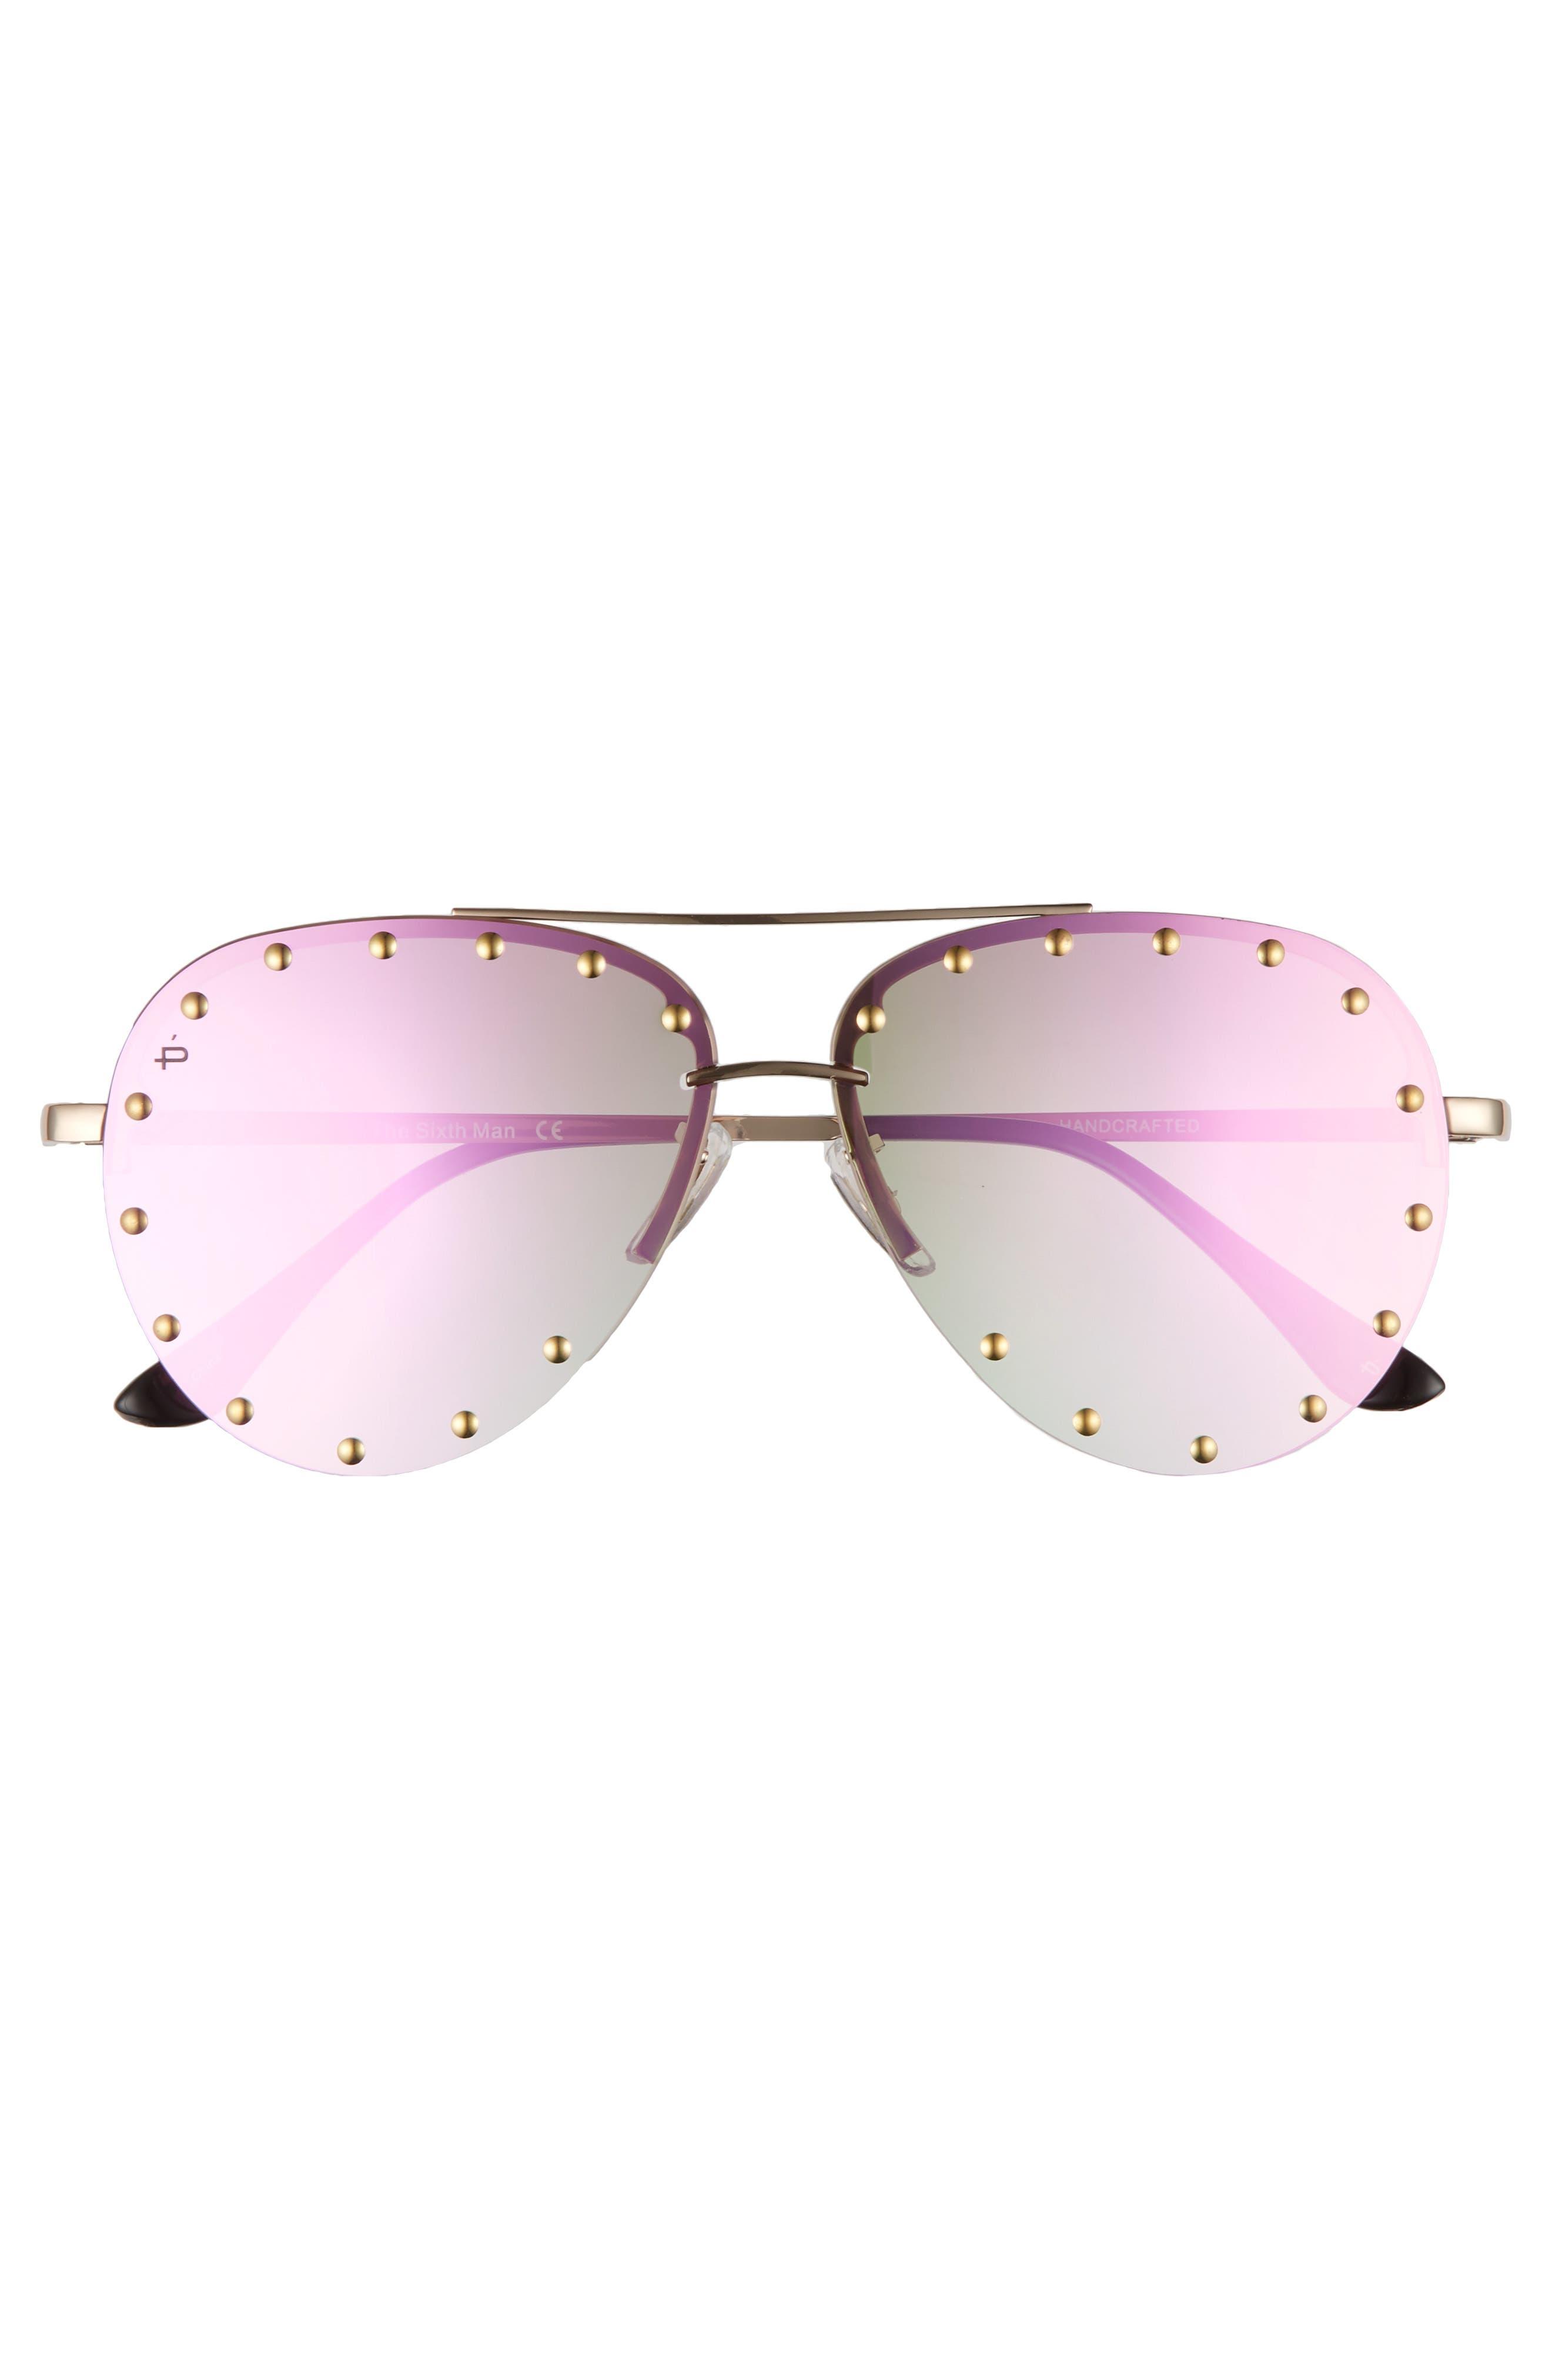 Privé Revaux The Sixth Man 60mm Studded Aviator Sunglasses,                             Alternate thumbnail 9, color,